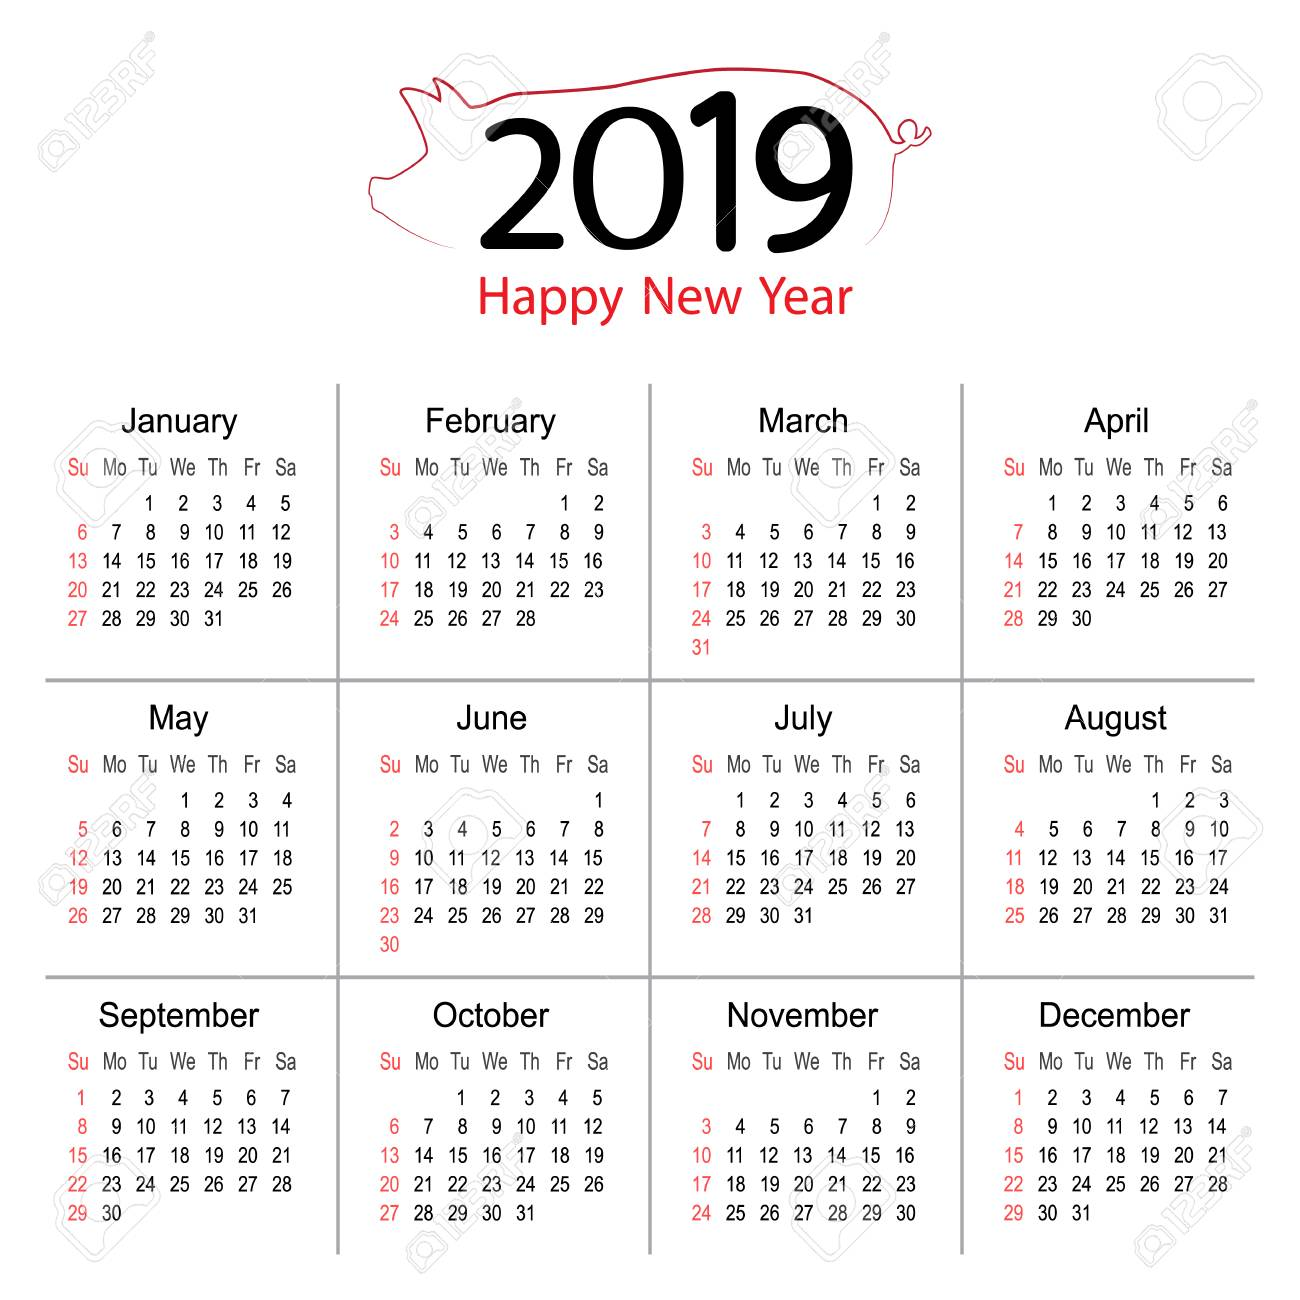 2019 Year Calendar Planner Of Pig Vector Design Template Vector